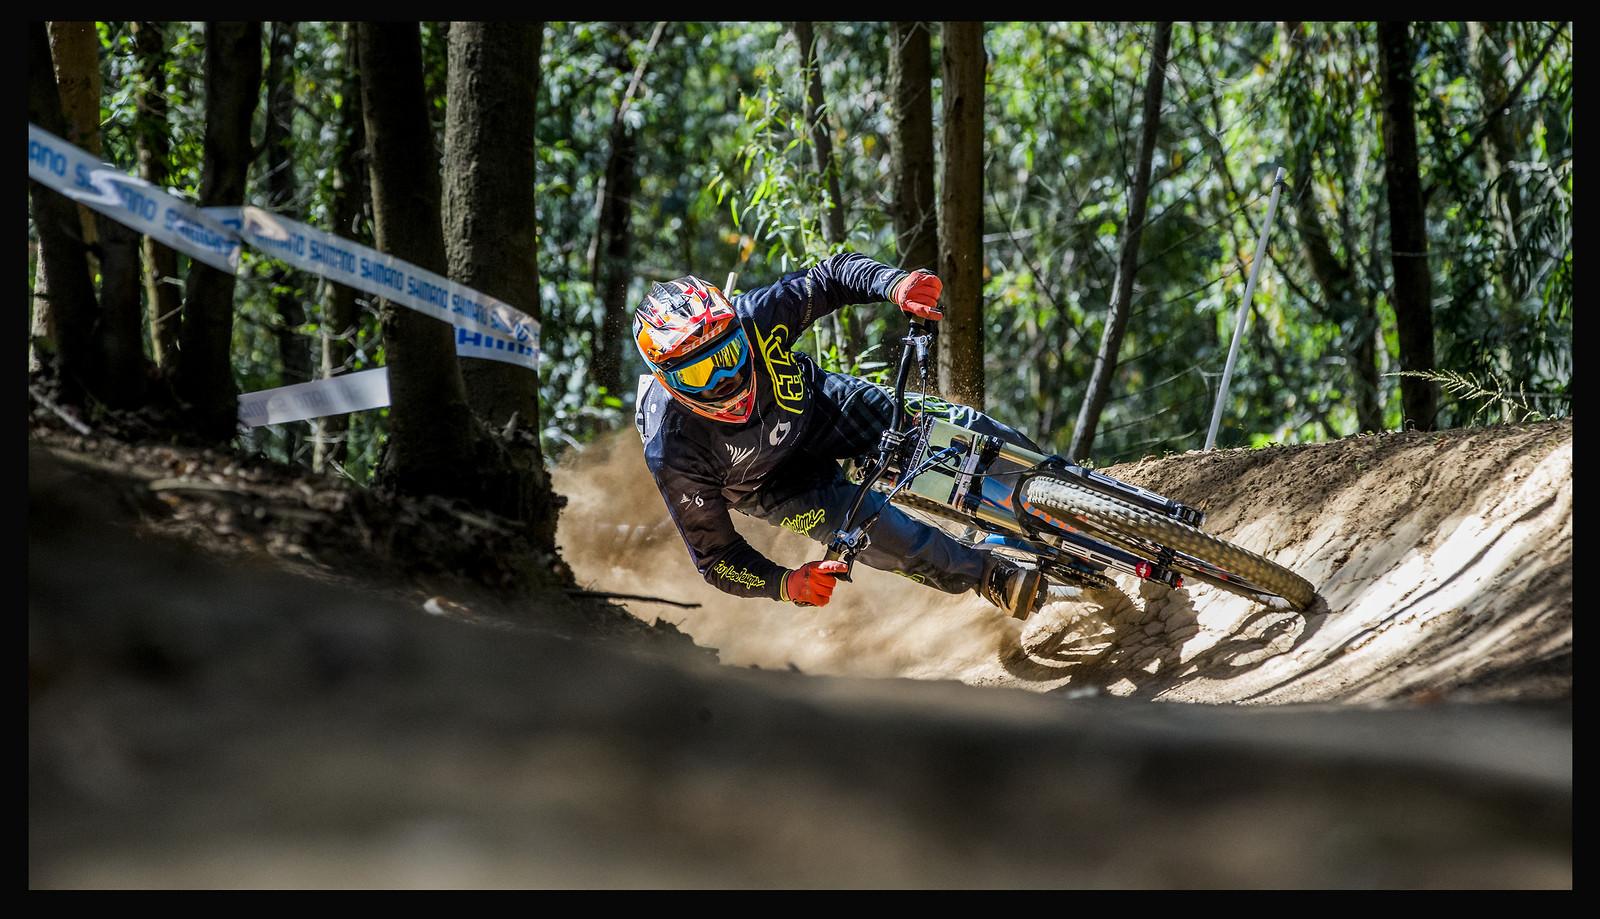 13784508874 5bd62ca0f7 k - phunkt.com - Mountain Biking Pictures - Vital MTB